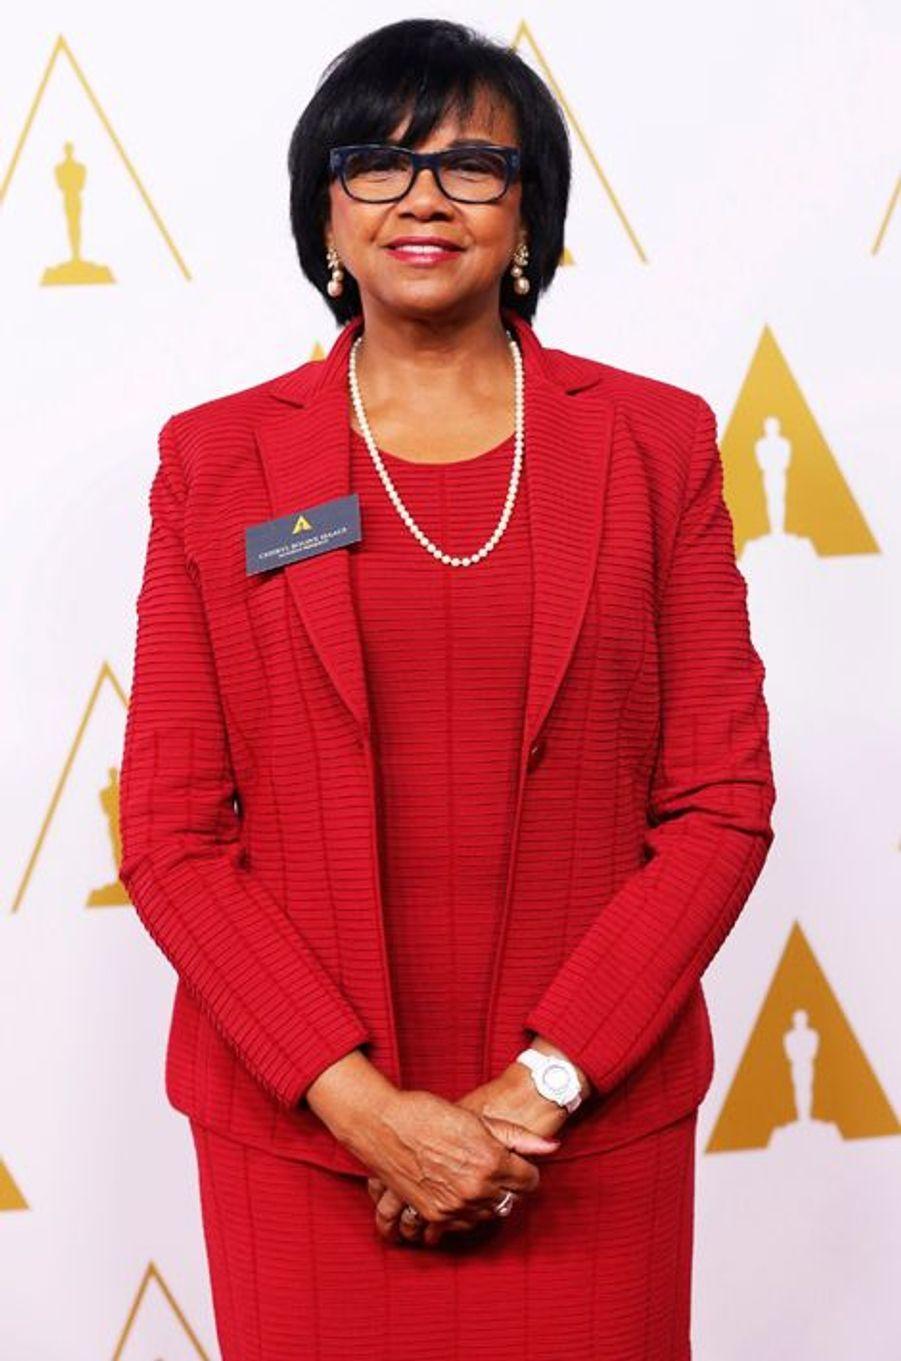 Cheryl Boone Isaacs, la présidente de l'Académie